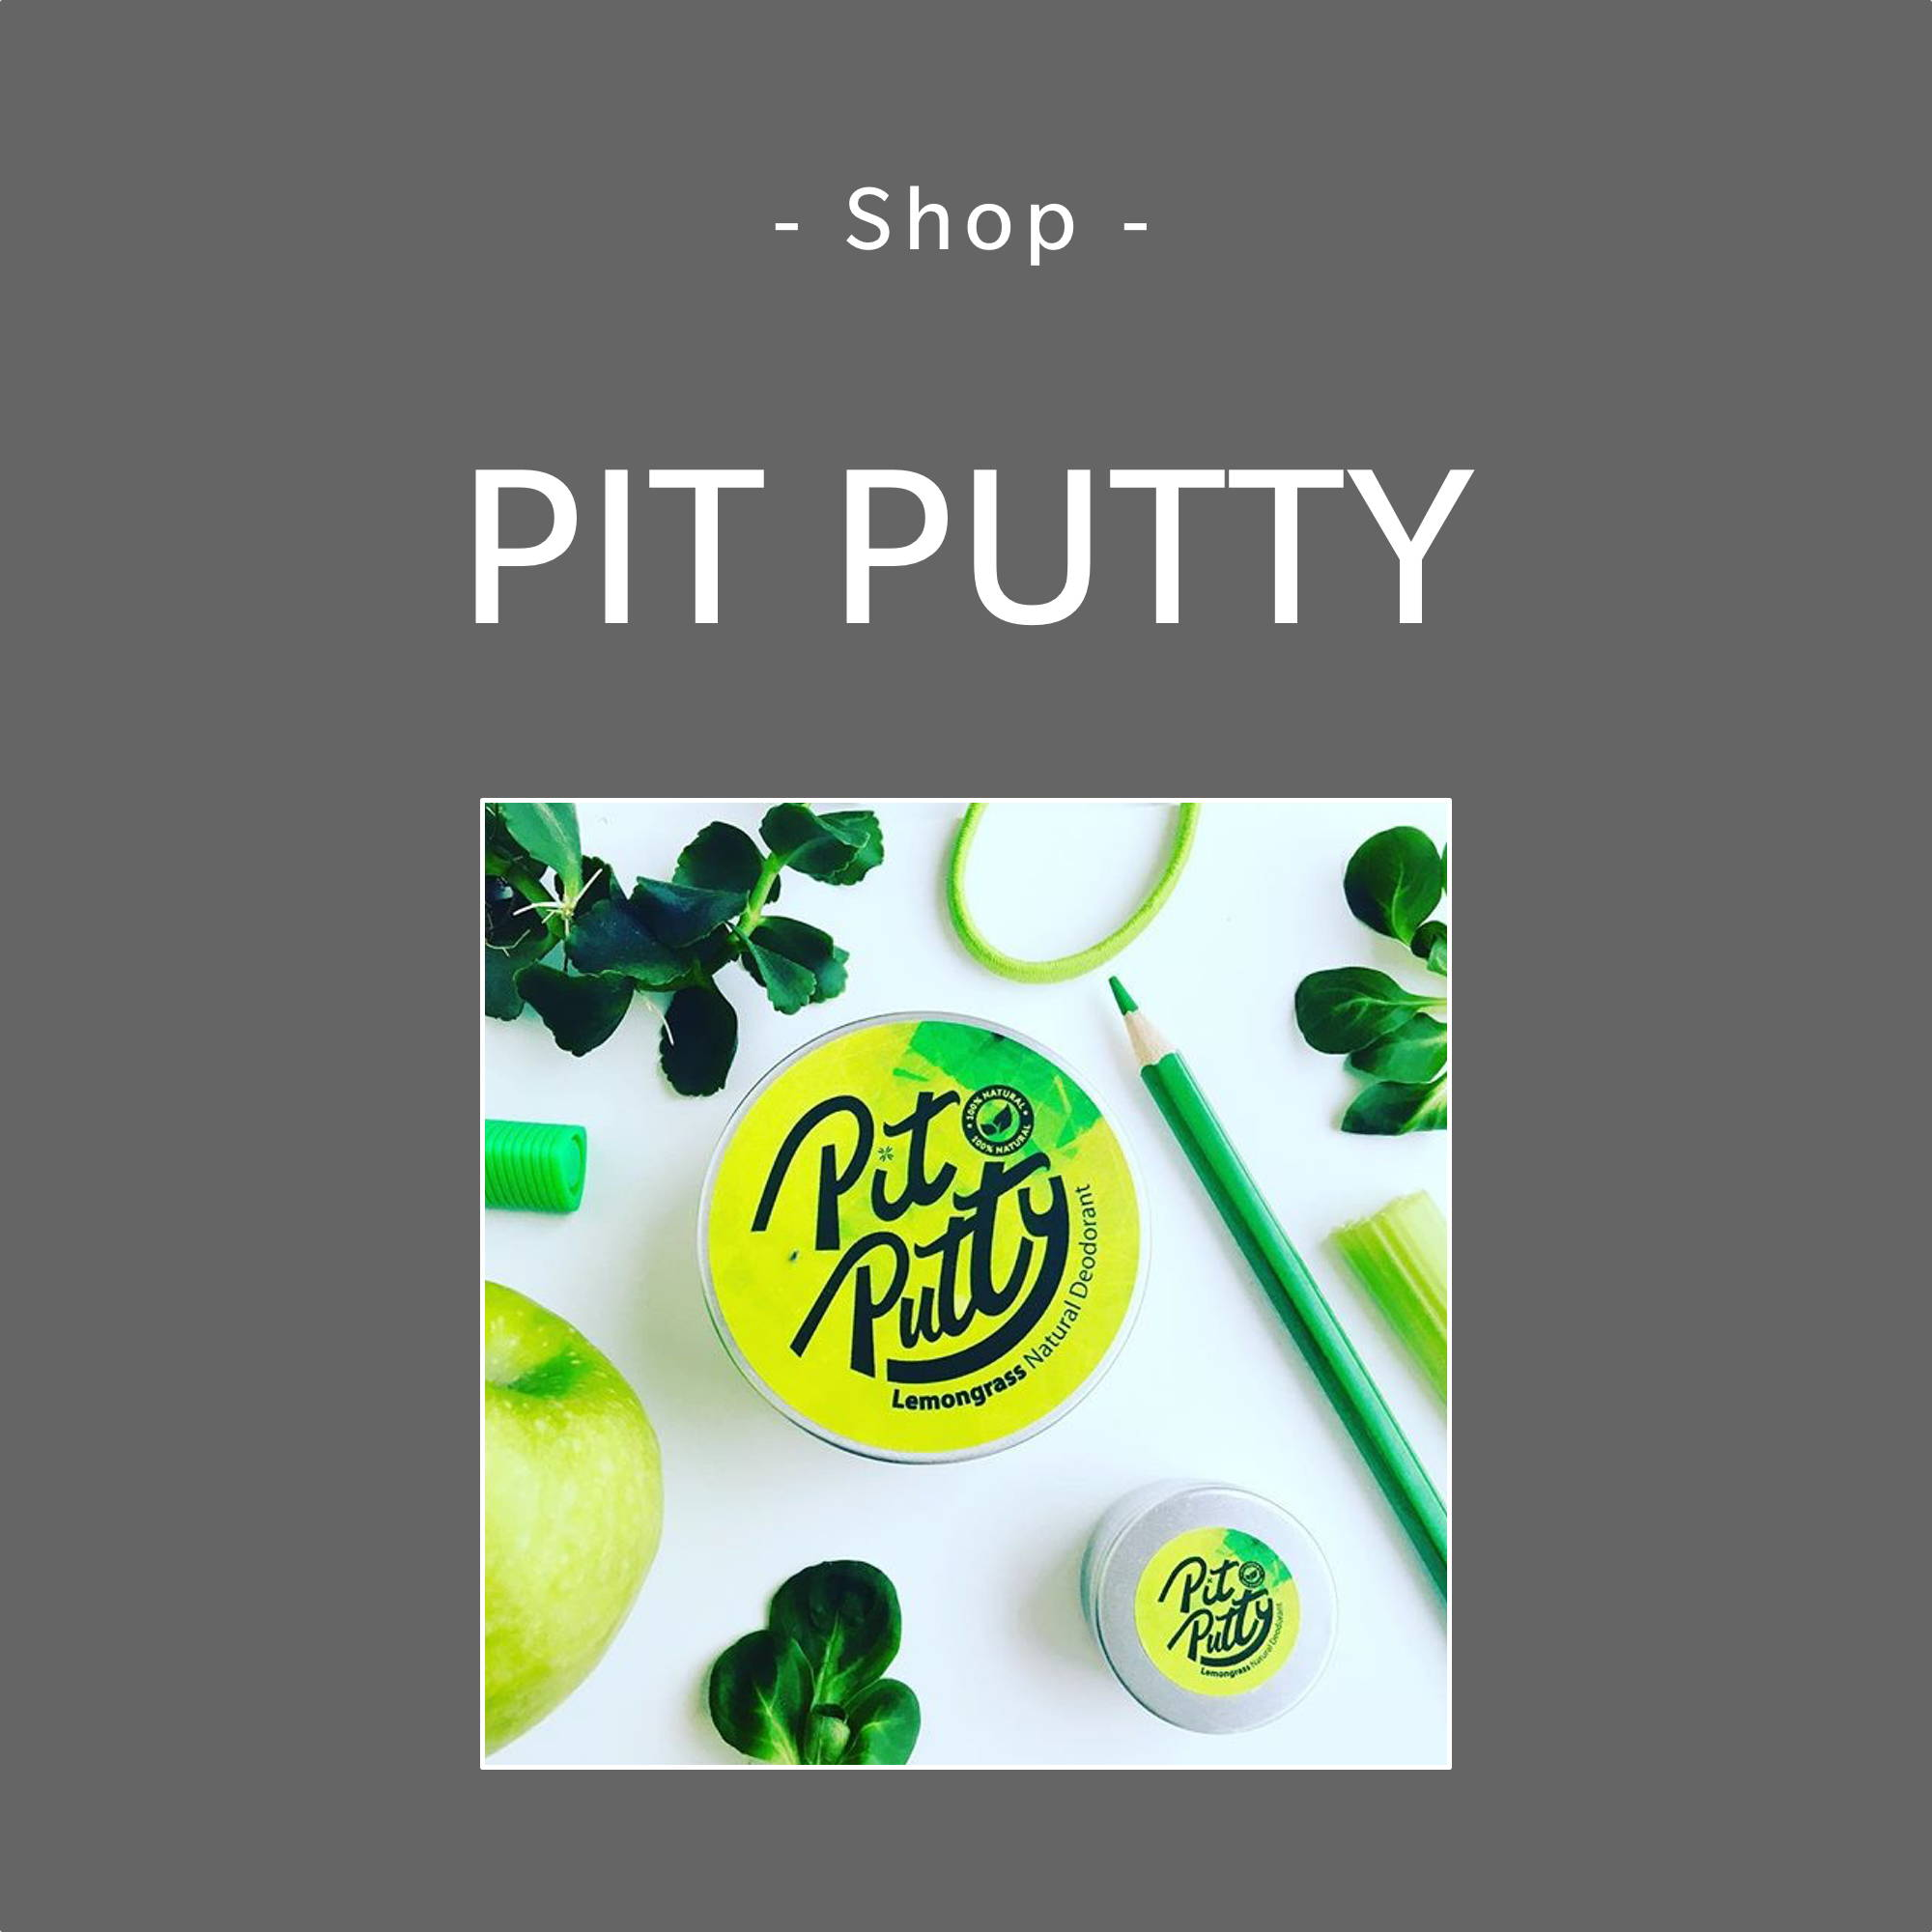 Pit Putty Brand Page